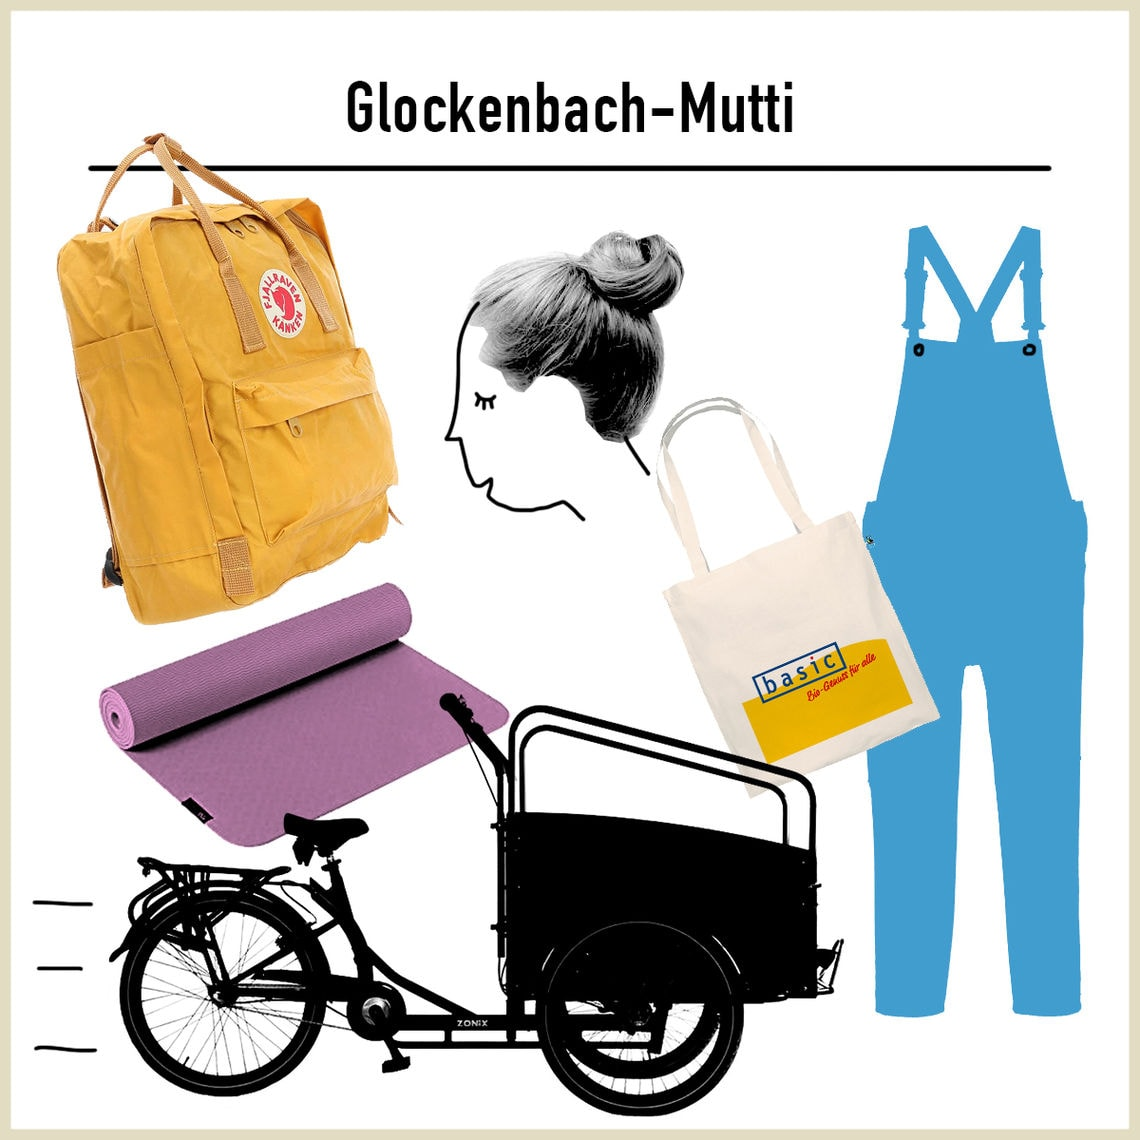 glackenbach mutti